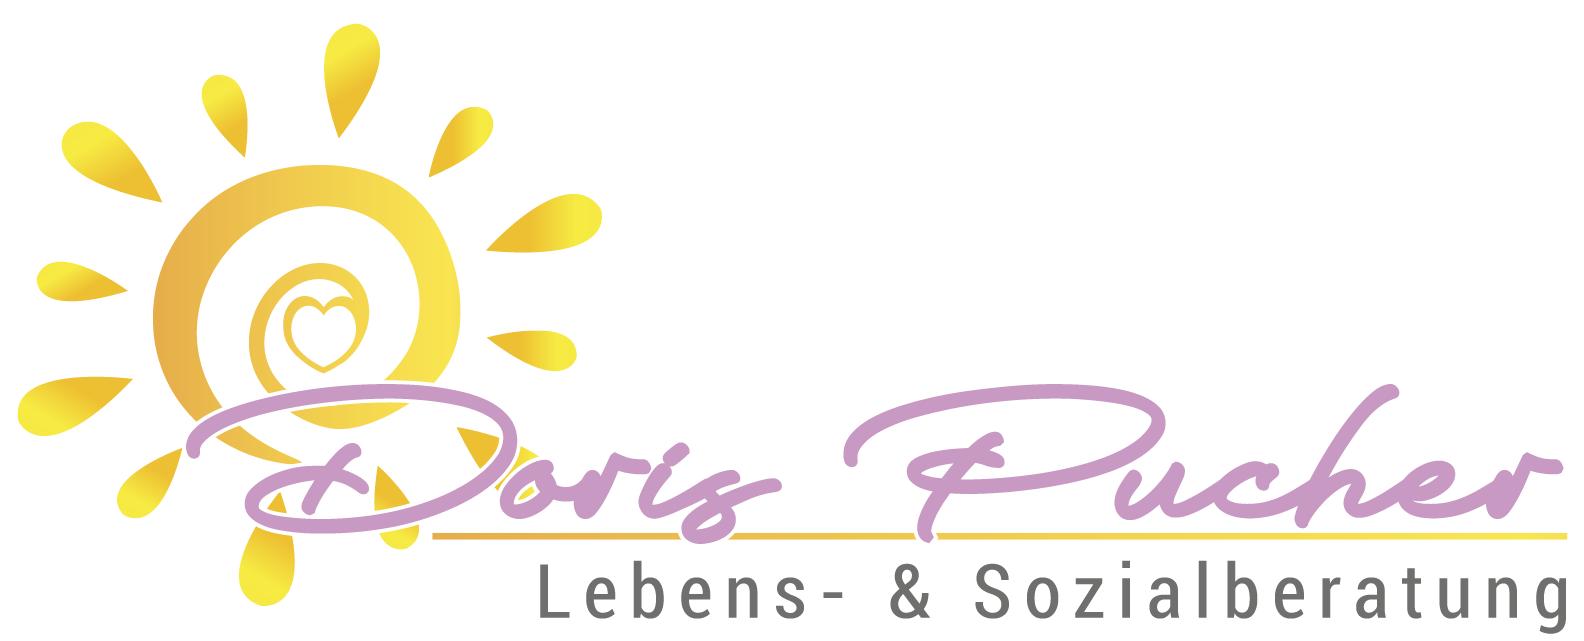 Lebens- & Sozialberatung Doris Pucher aus Schlüßlberg/OÖ | Lebens- & Sozialberatung Doris Pucher - Psychologische Beratung, Coaching, Selbsterfahrung, Jugendberatung, Elternberatung & Traumapädagogische Beratung aus OÖ.